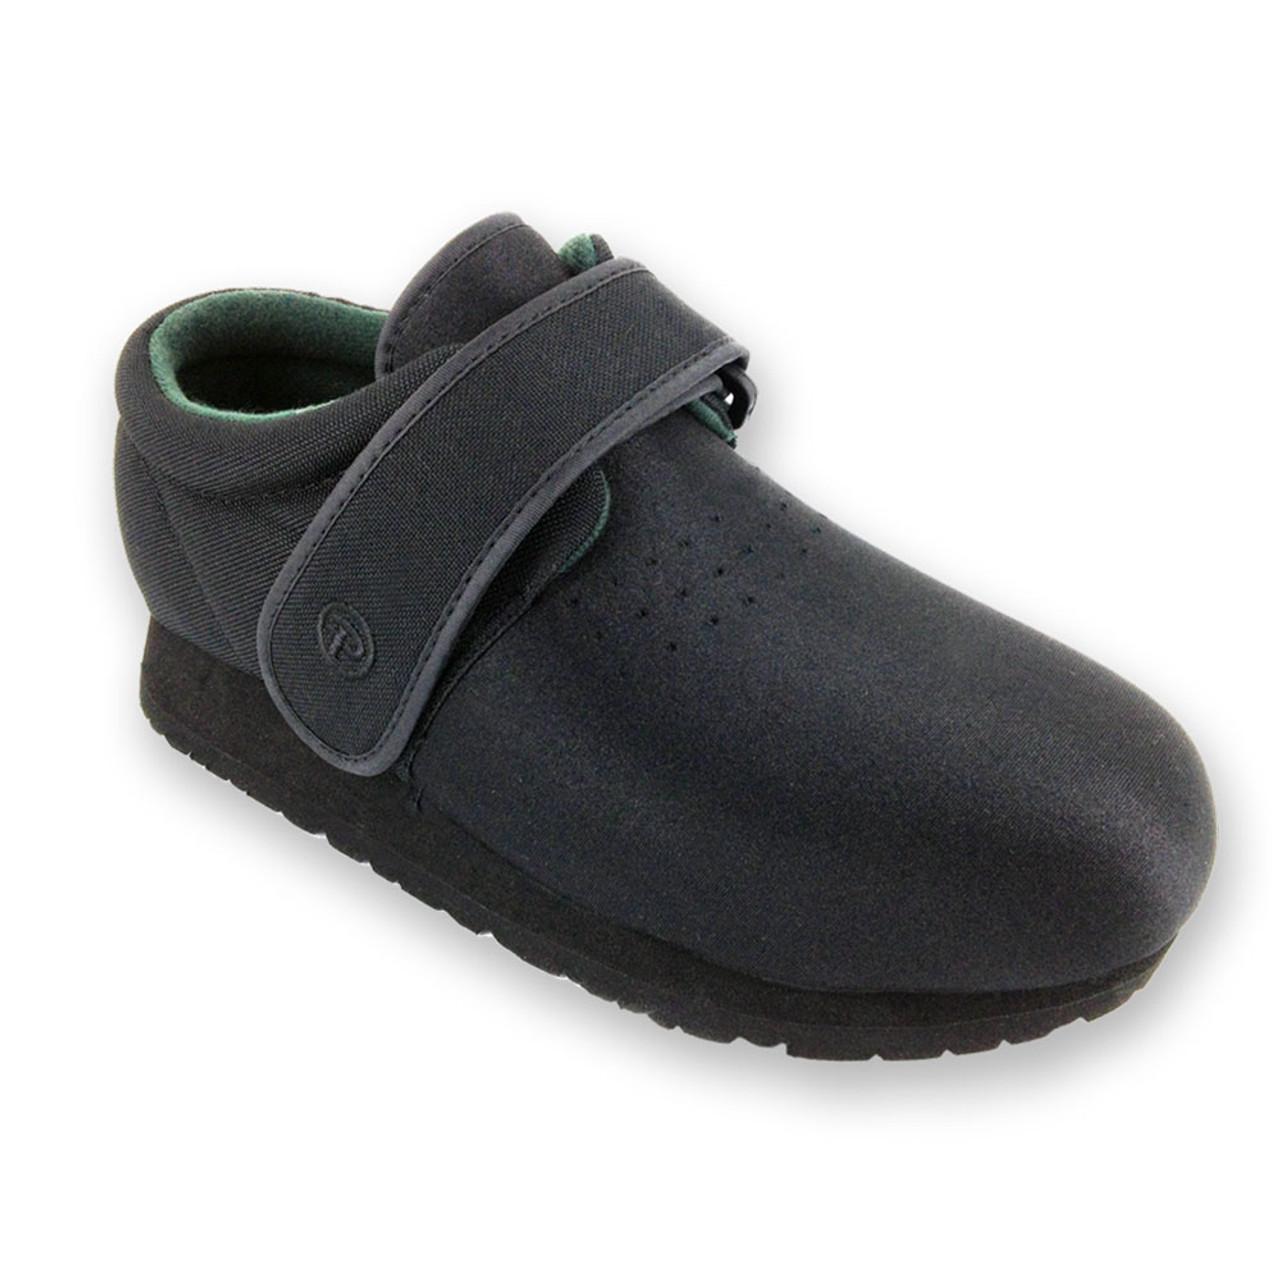 Shoes For Swollen Feet  1778e491b